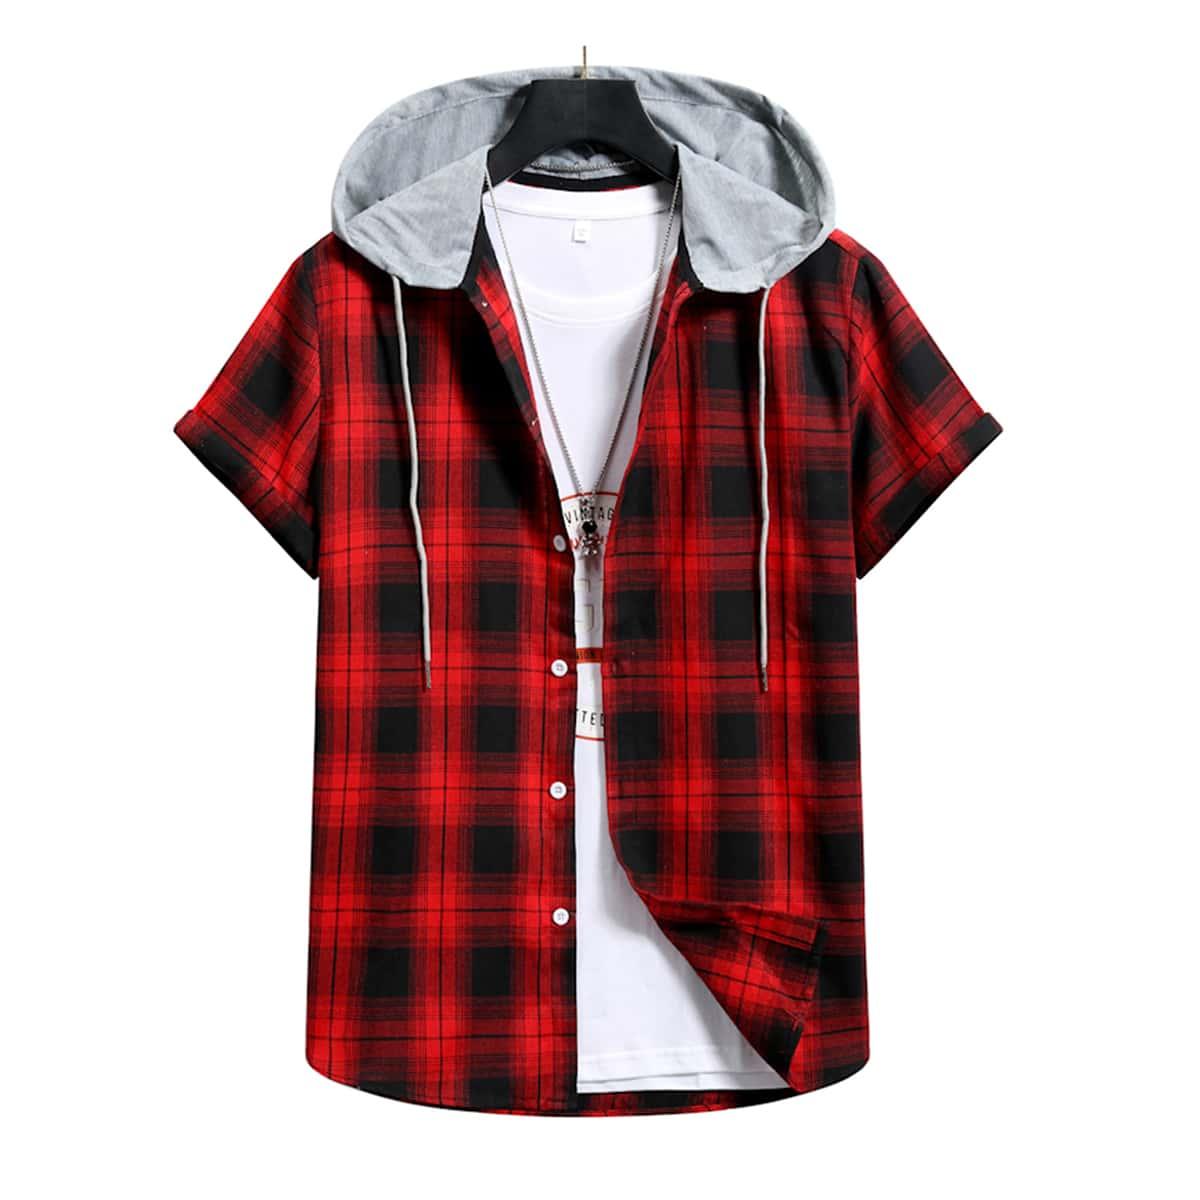 на кулиске Клетчатый Институтский Мужские рубашки SheIn smshirt03210113304